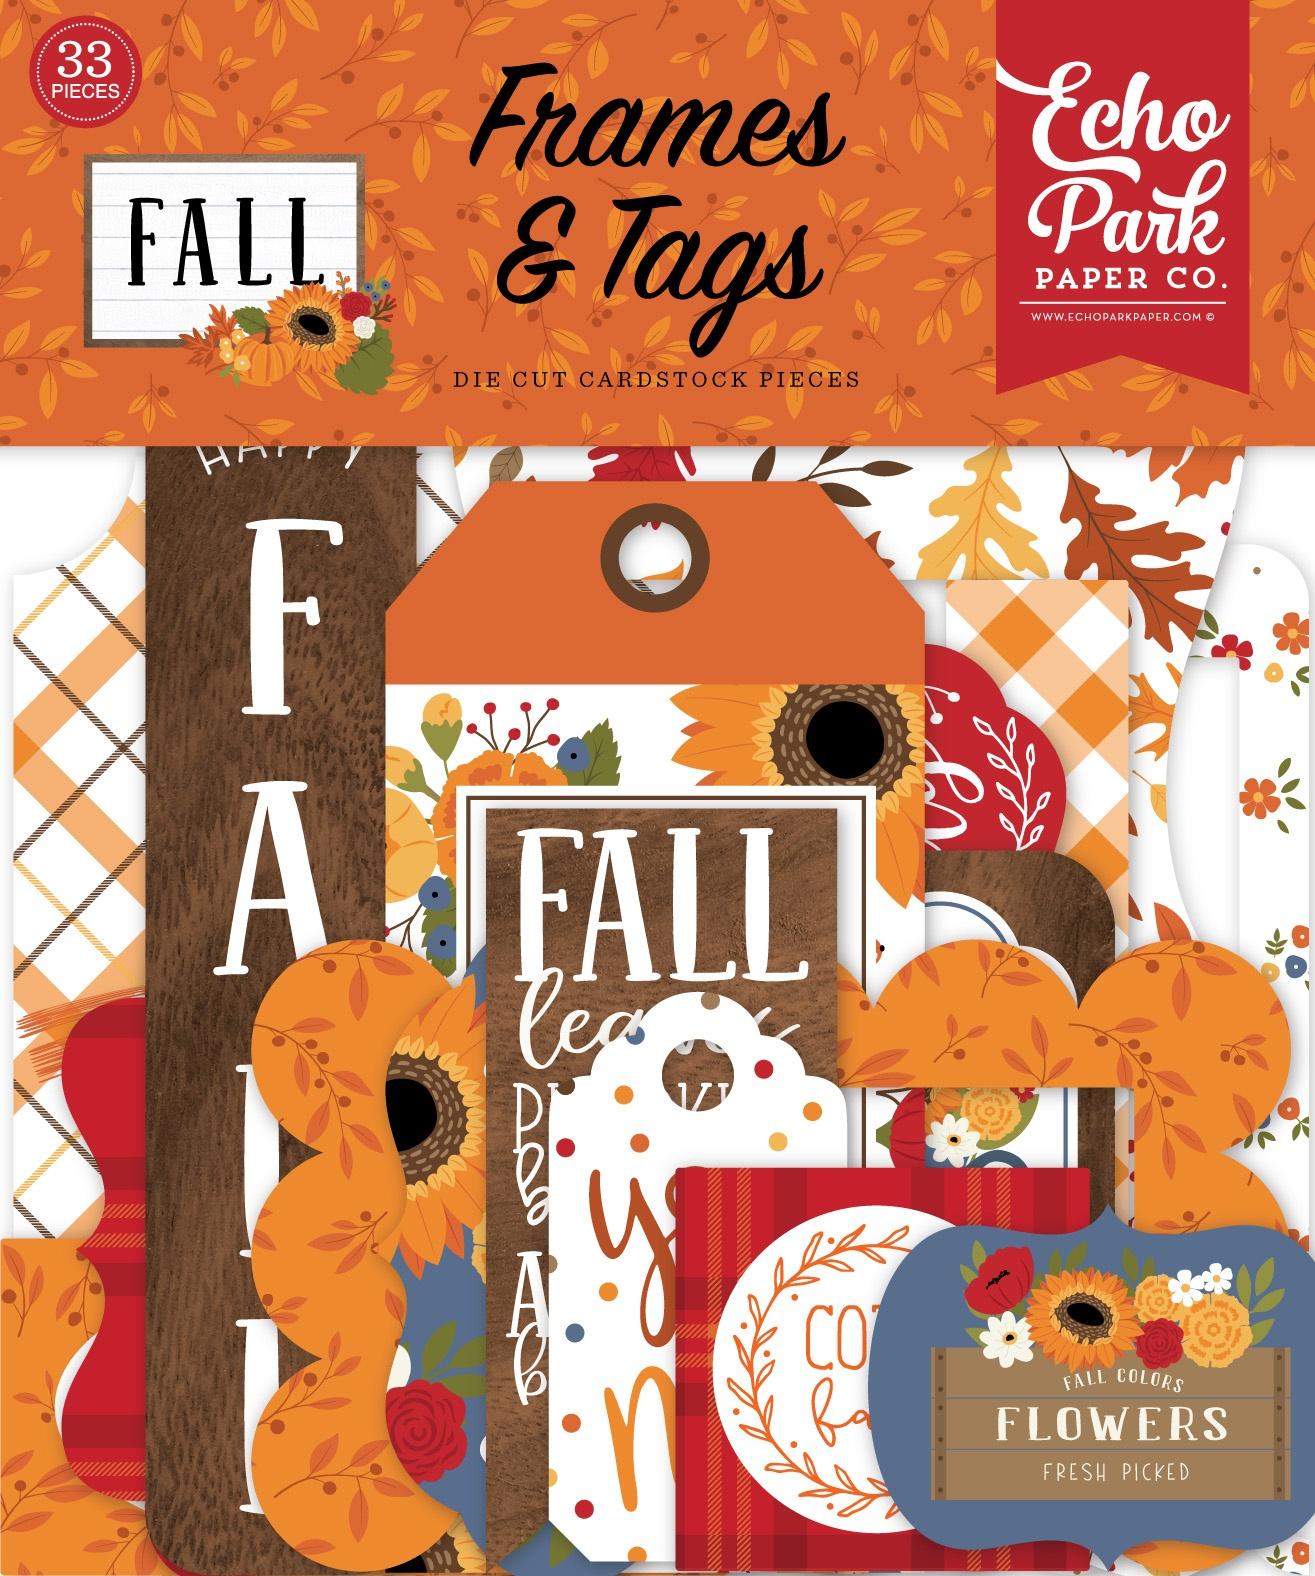 Echo Park Cardstock Ephemera 33/Pkg-Frames & Tags, Fall